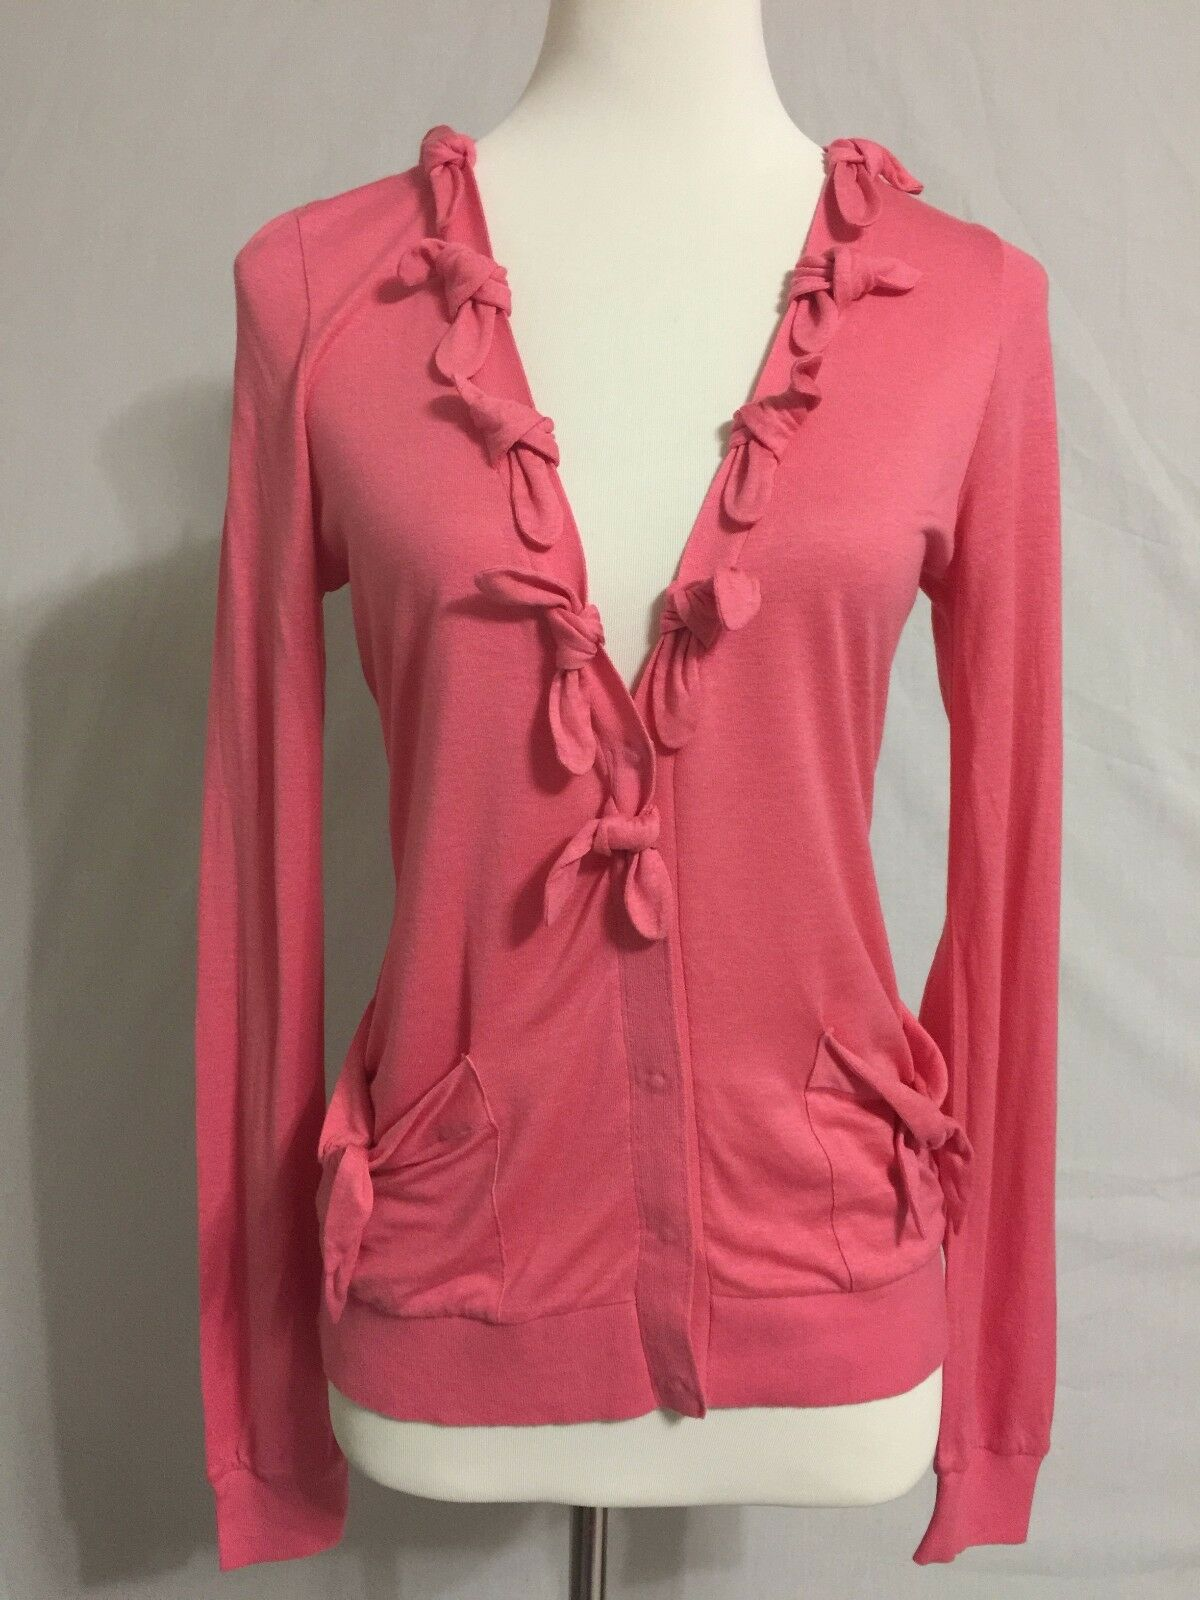 New Anthropologie Leifsdottir Pink Bow Buttondown Cardigan Sweater Sz S 4 6